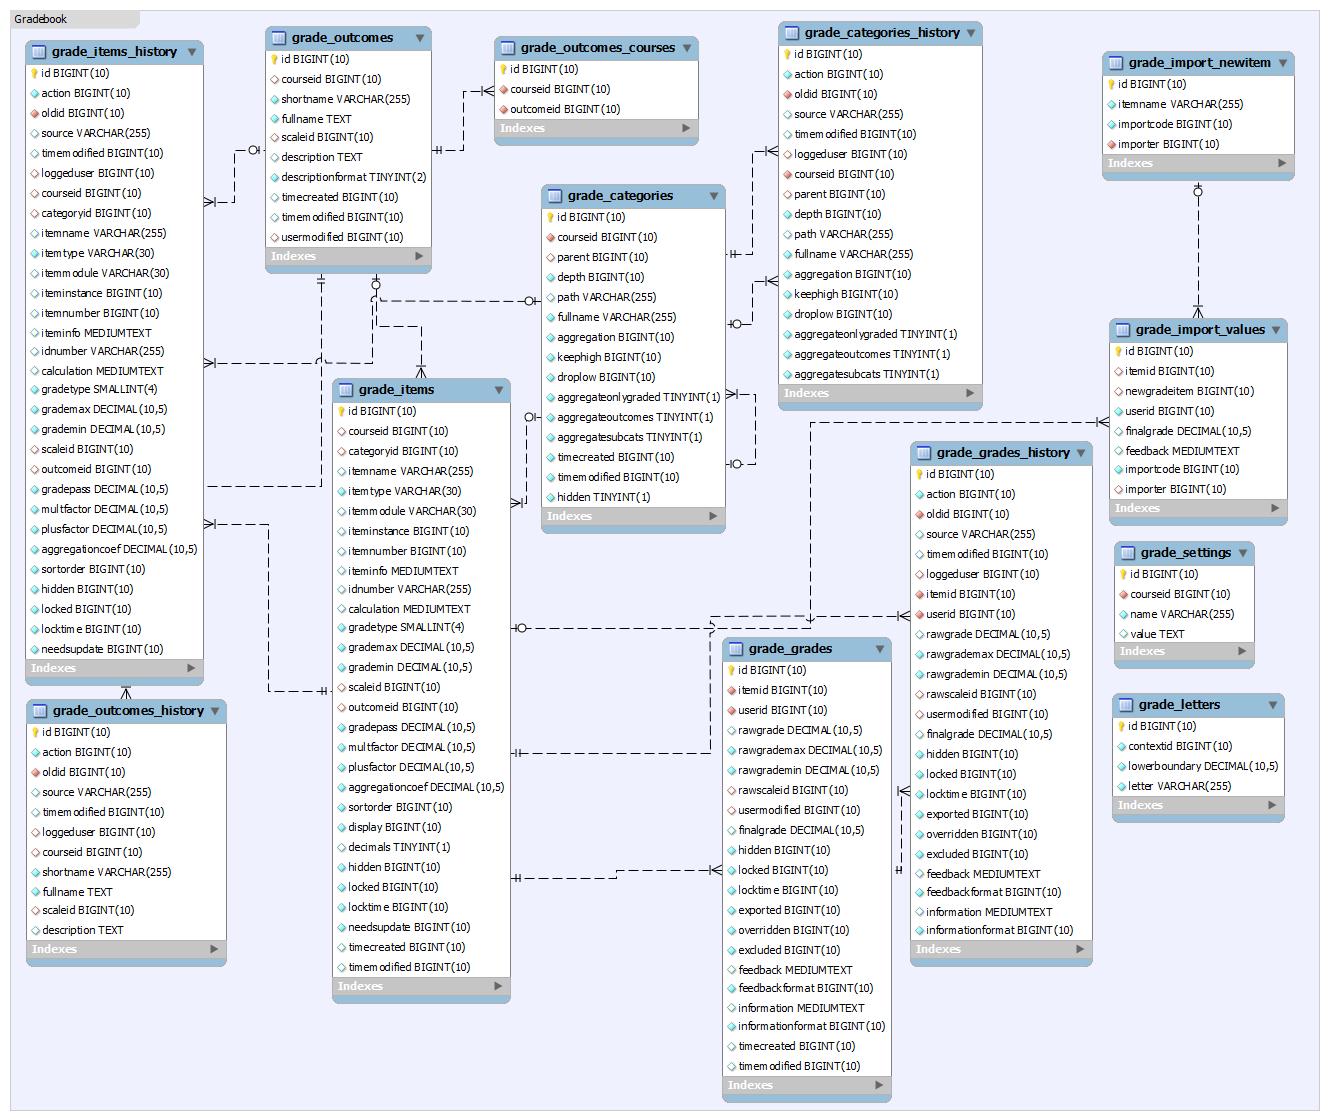 hight resolution of er diagram of the gradebook system